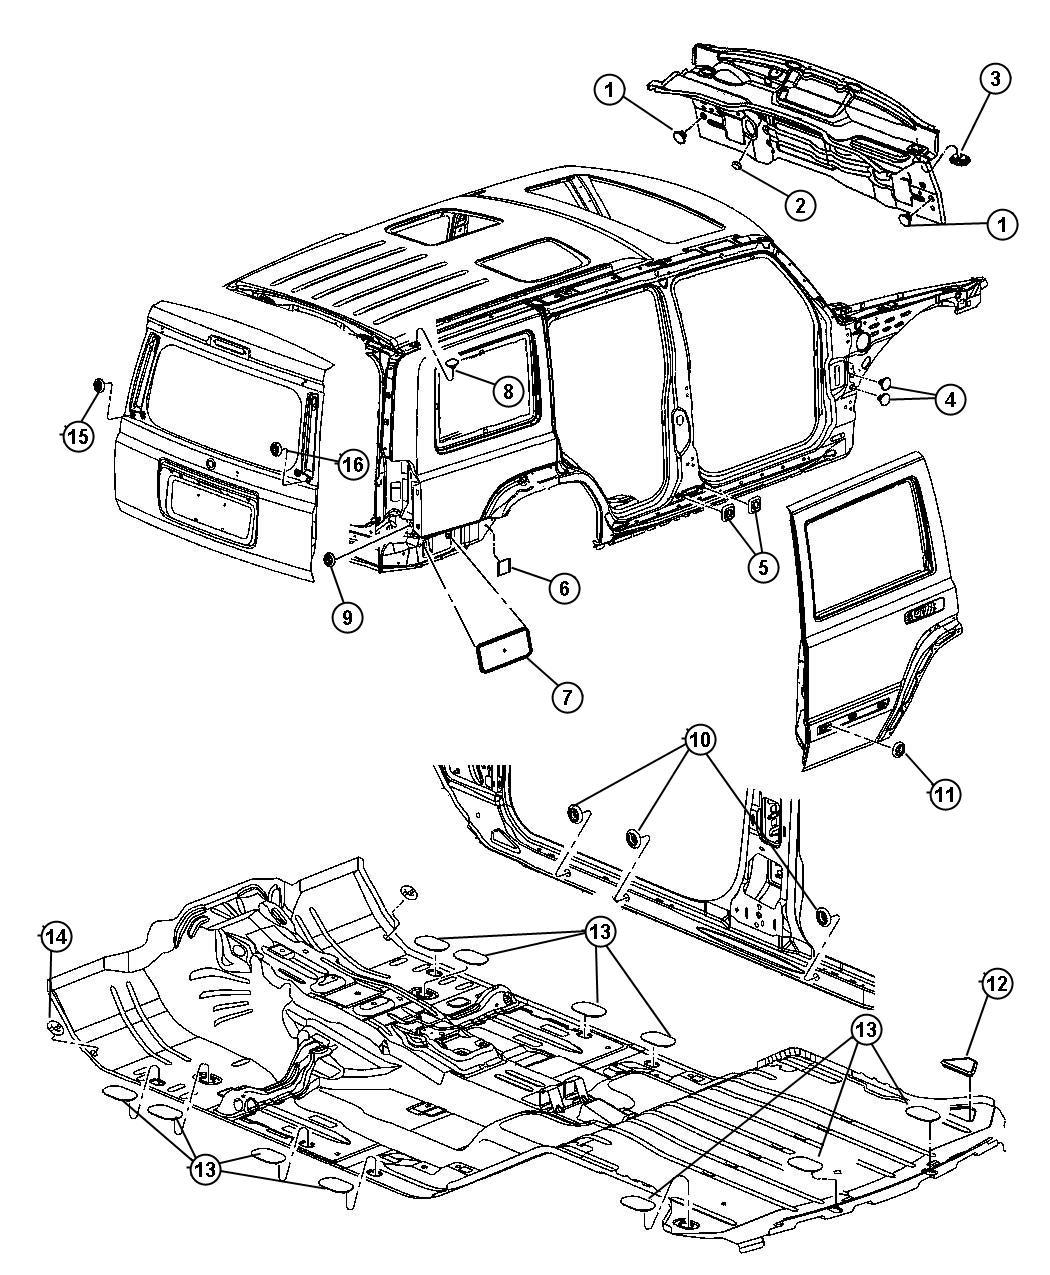 Jeep Commander Plug. Body, rear fascia. Aperture panel